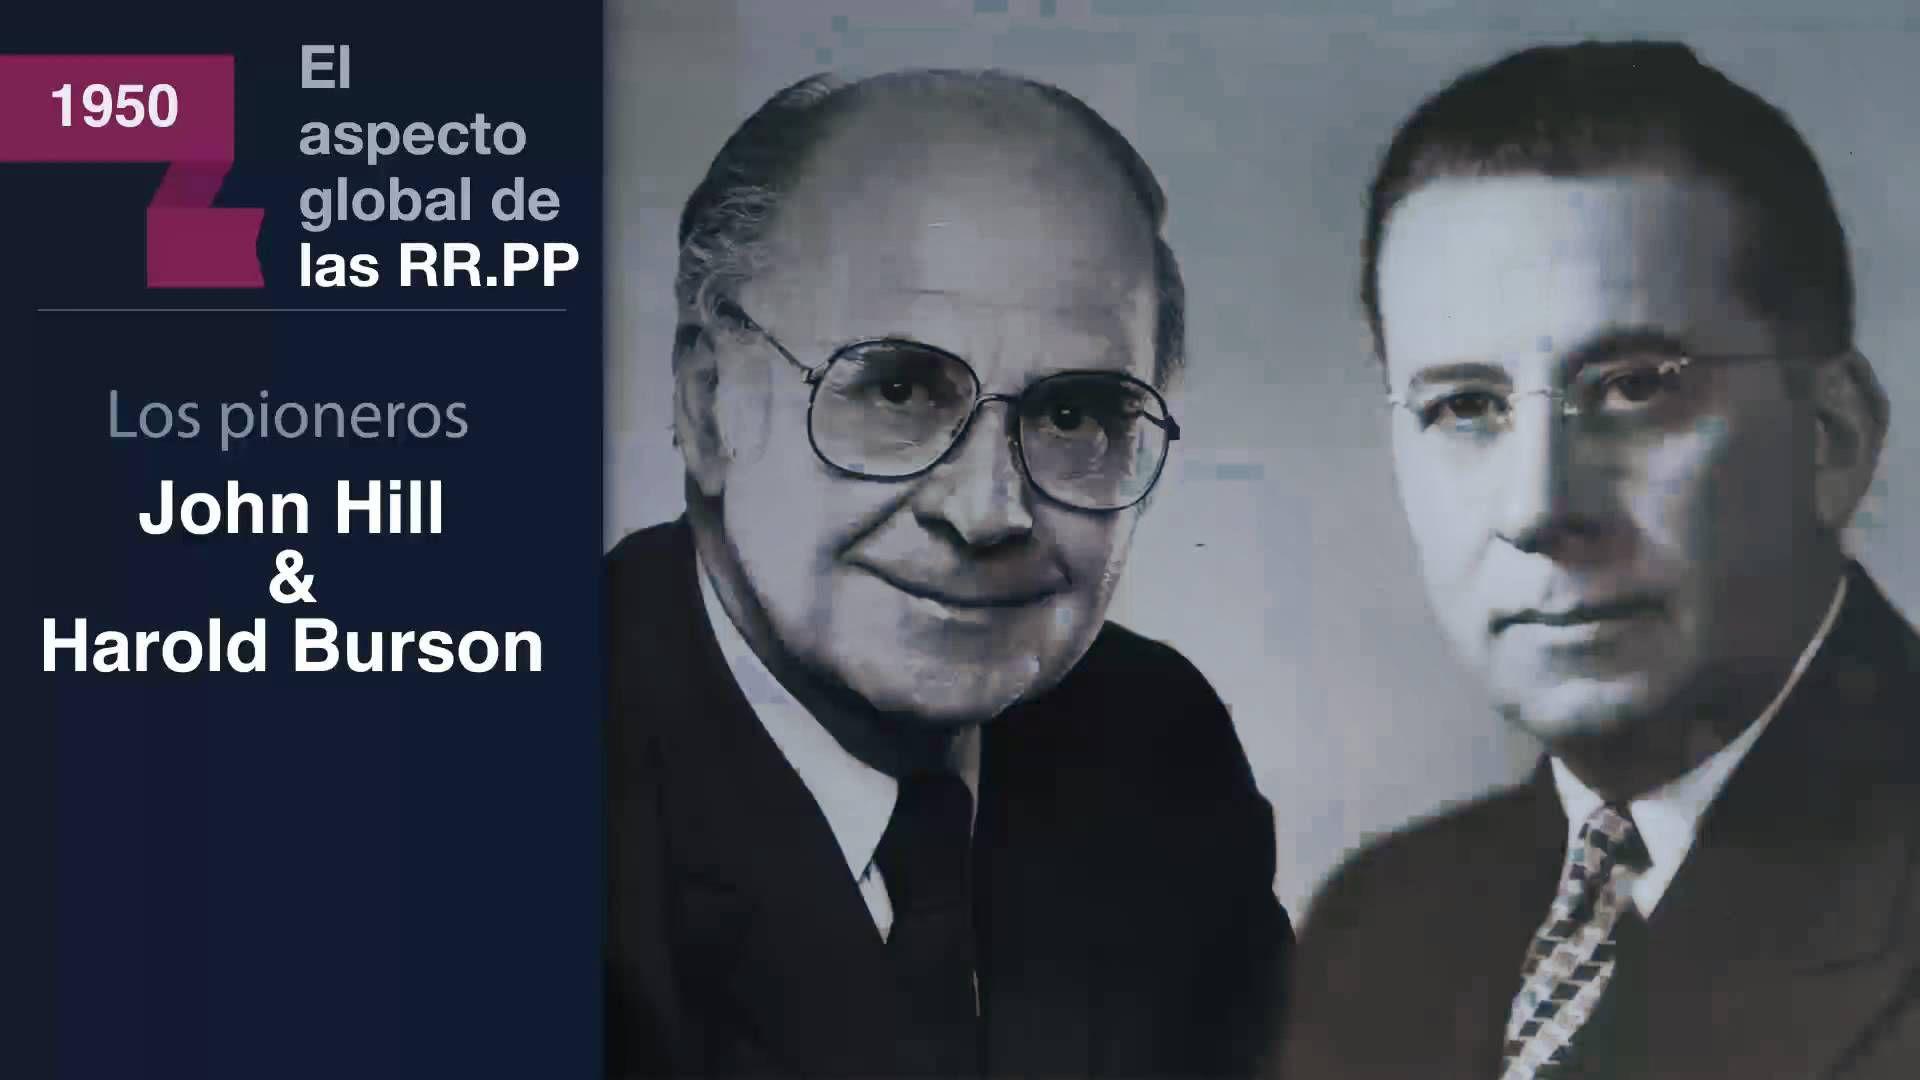 La Historia de las RR.PP #Comunicate #RelacionesPublicas #Nicaragua #Historia